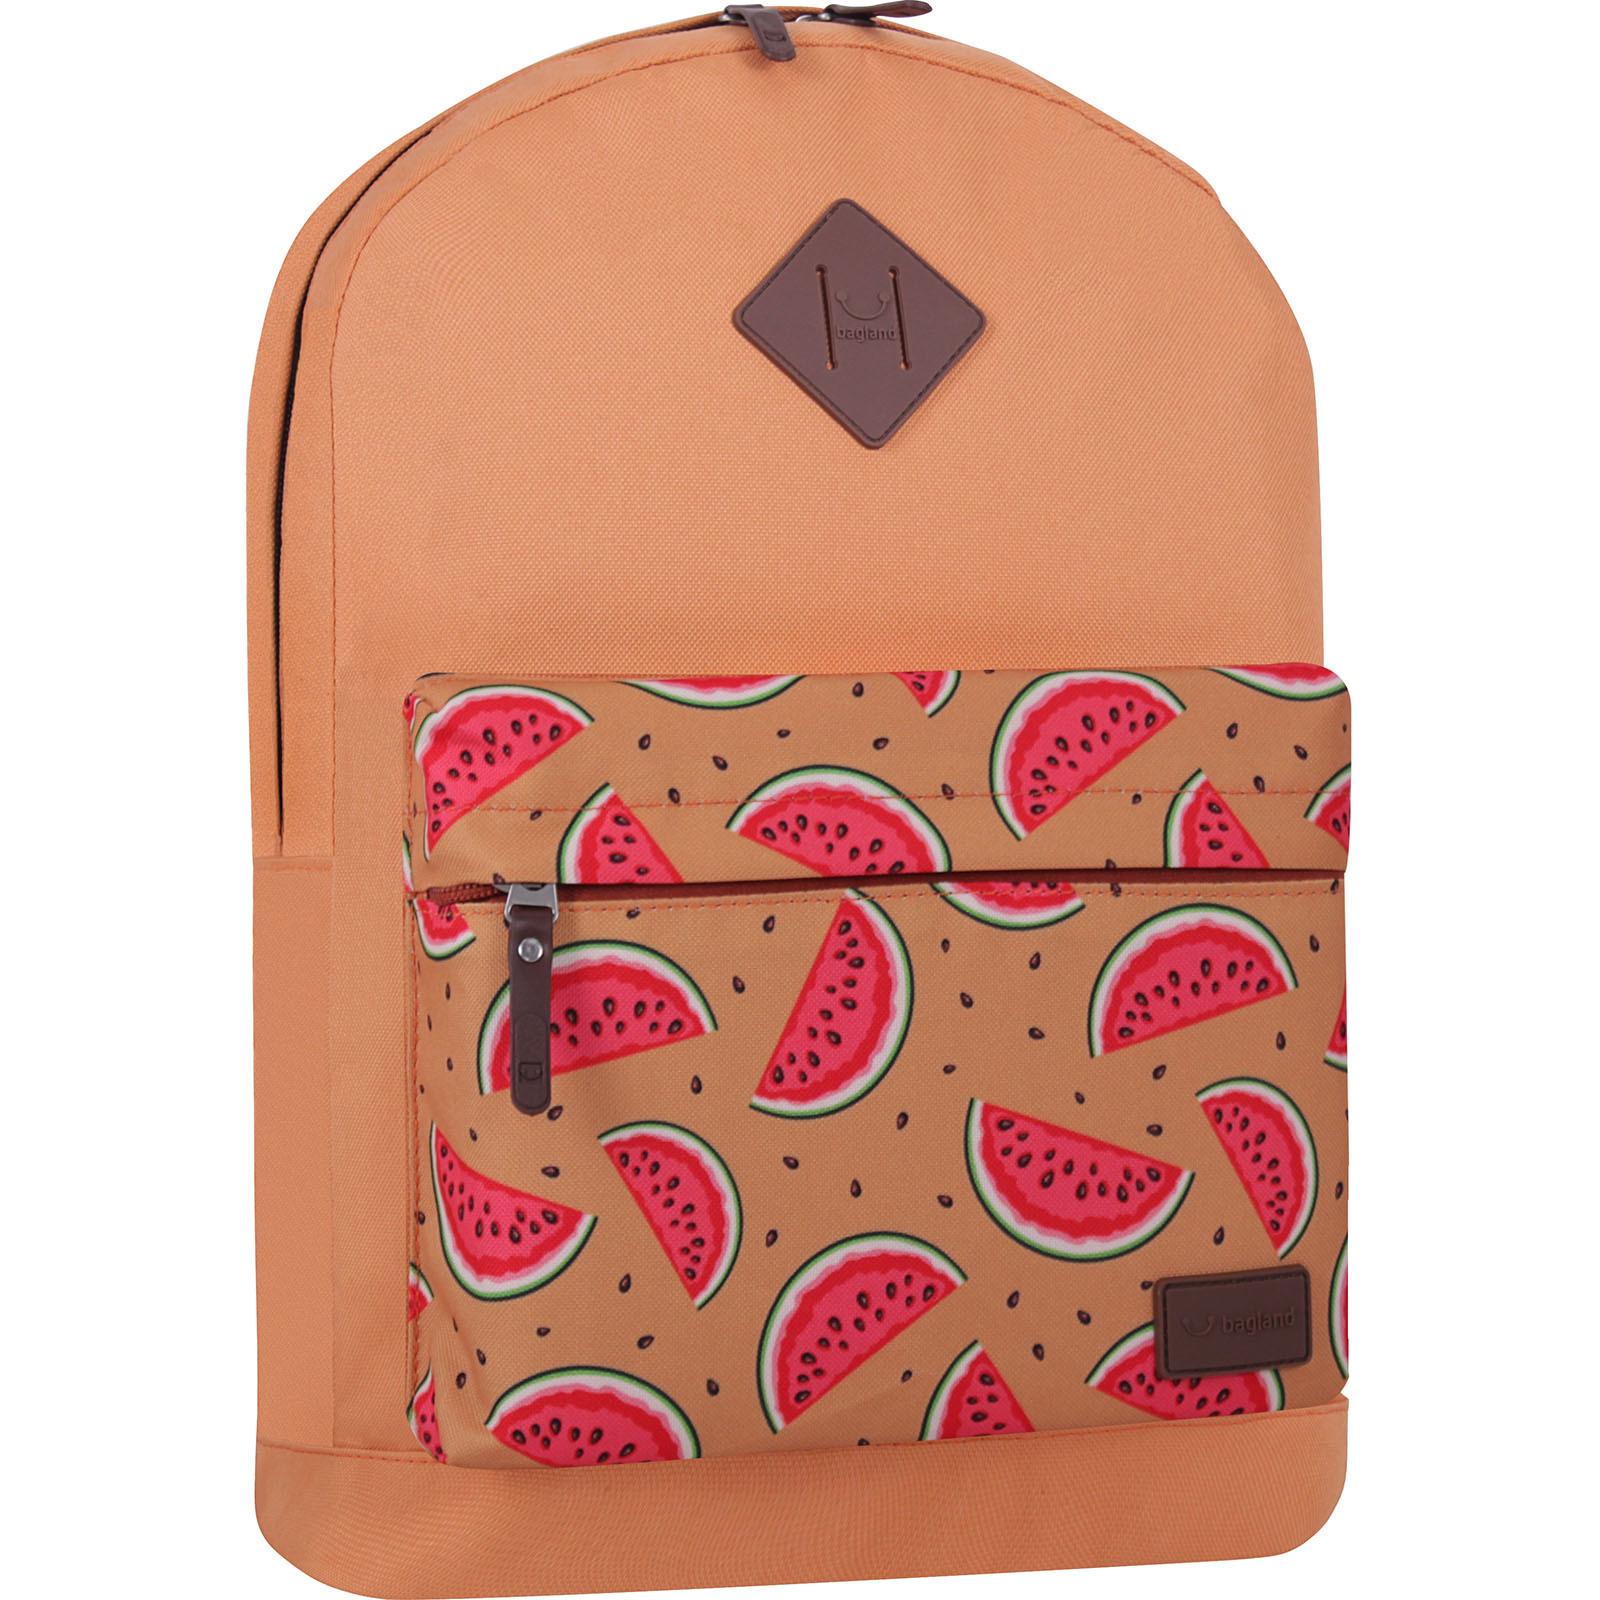 Молодежные рюкзаки Рюкзак Bagland Молодежный W/R 17 л. Рыжий 736 (00533662) IMG_7344_суб736_-1600.jpg